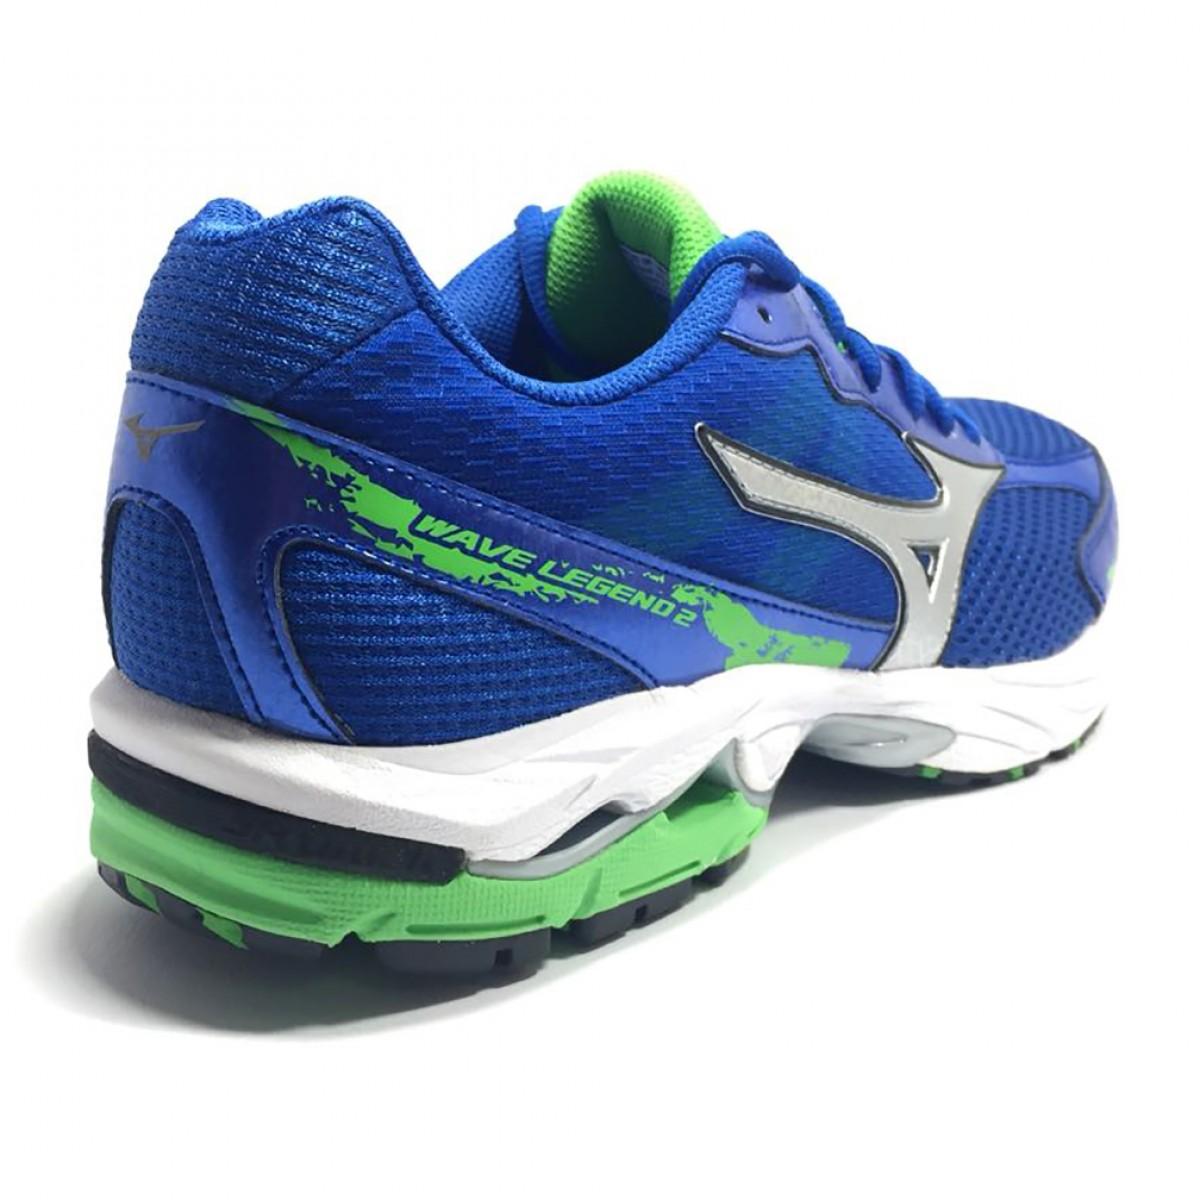 a851af689d Tenis Masculino Mizuno Legend 2 Azul e Verde - Compre Agora